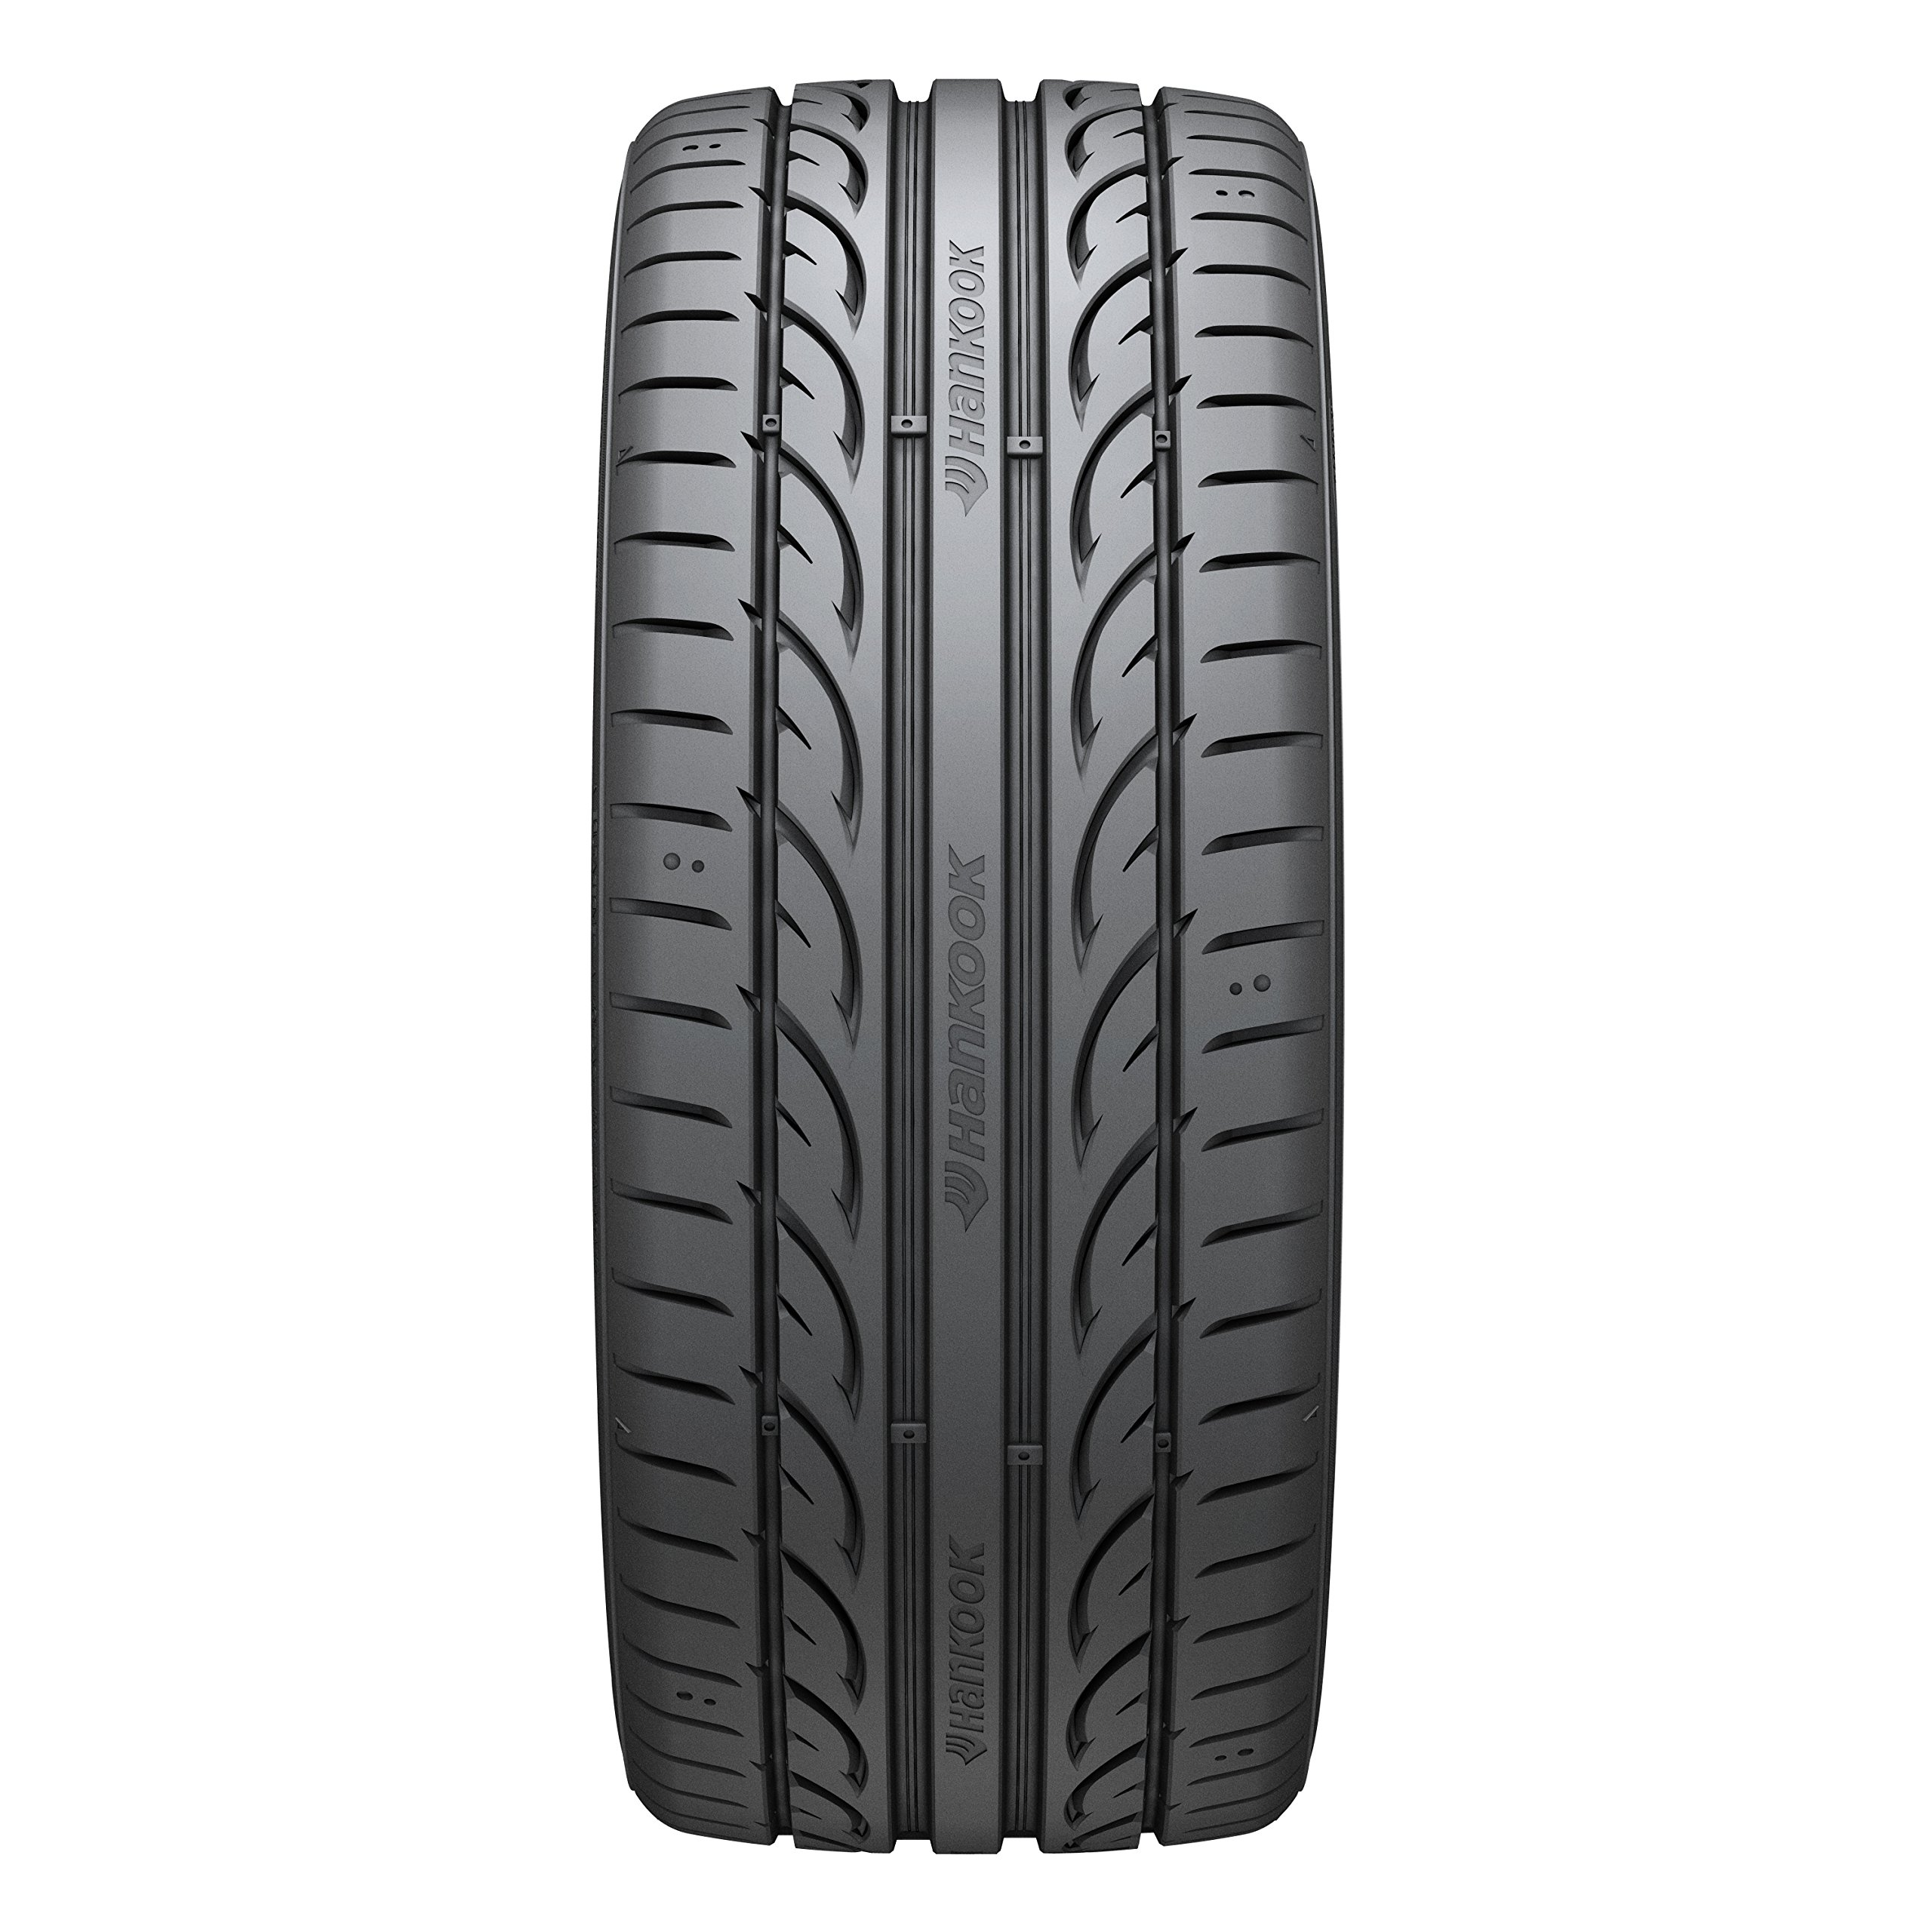 Hankook Ventus V12 evo 2 Summer Radial Tire - 225/40R18 Y